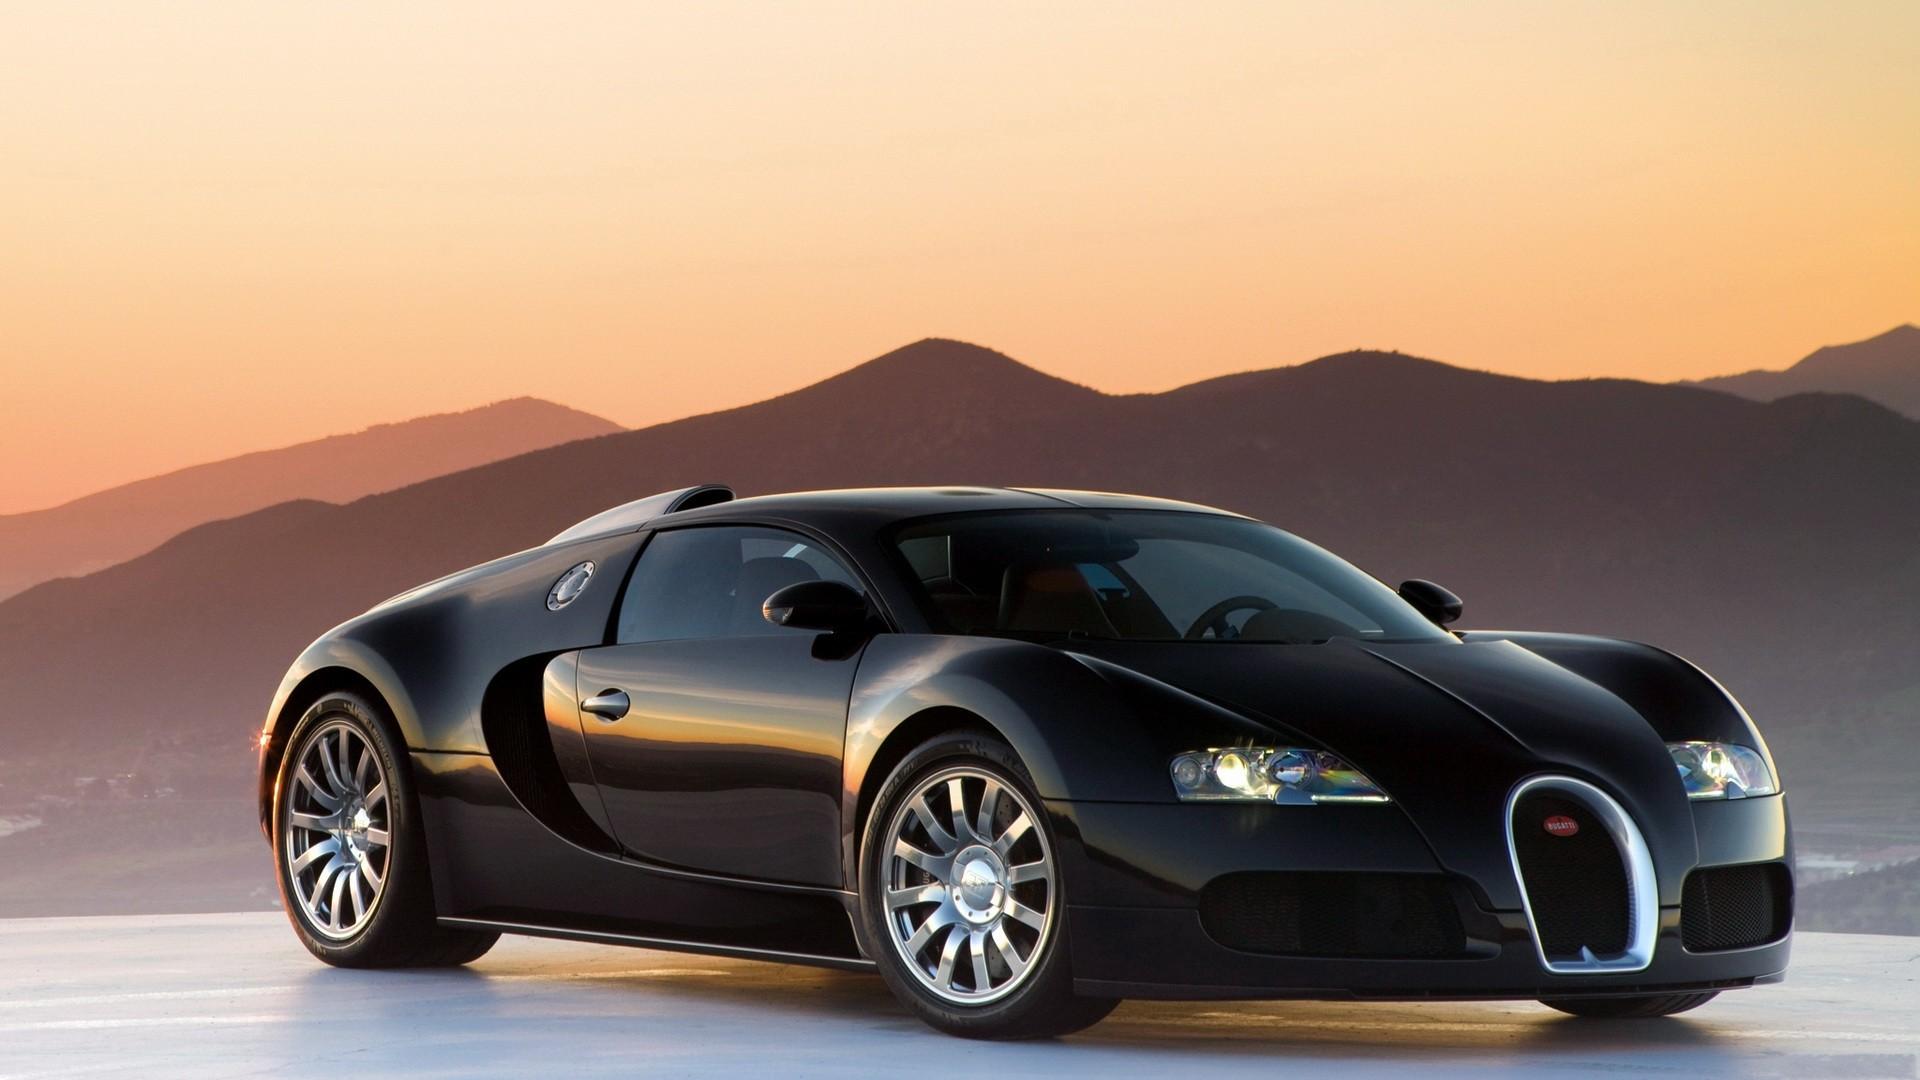 bugatti_veyron-9 Amazing Bugatti Veyron Price In Egypt Cars Trend